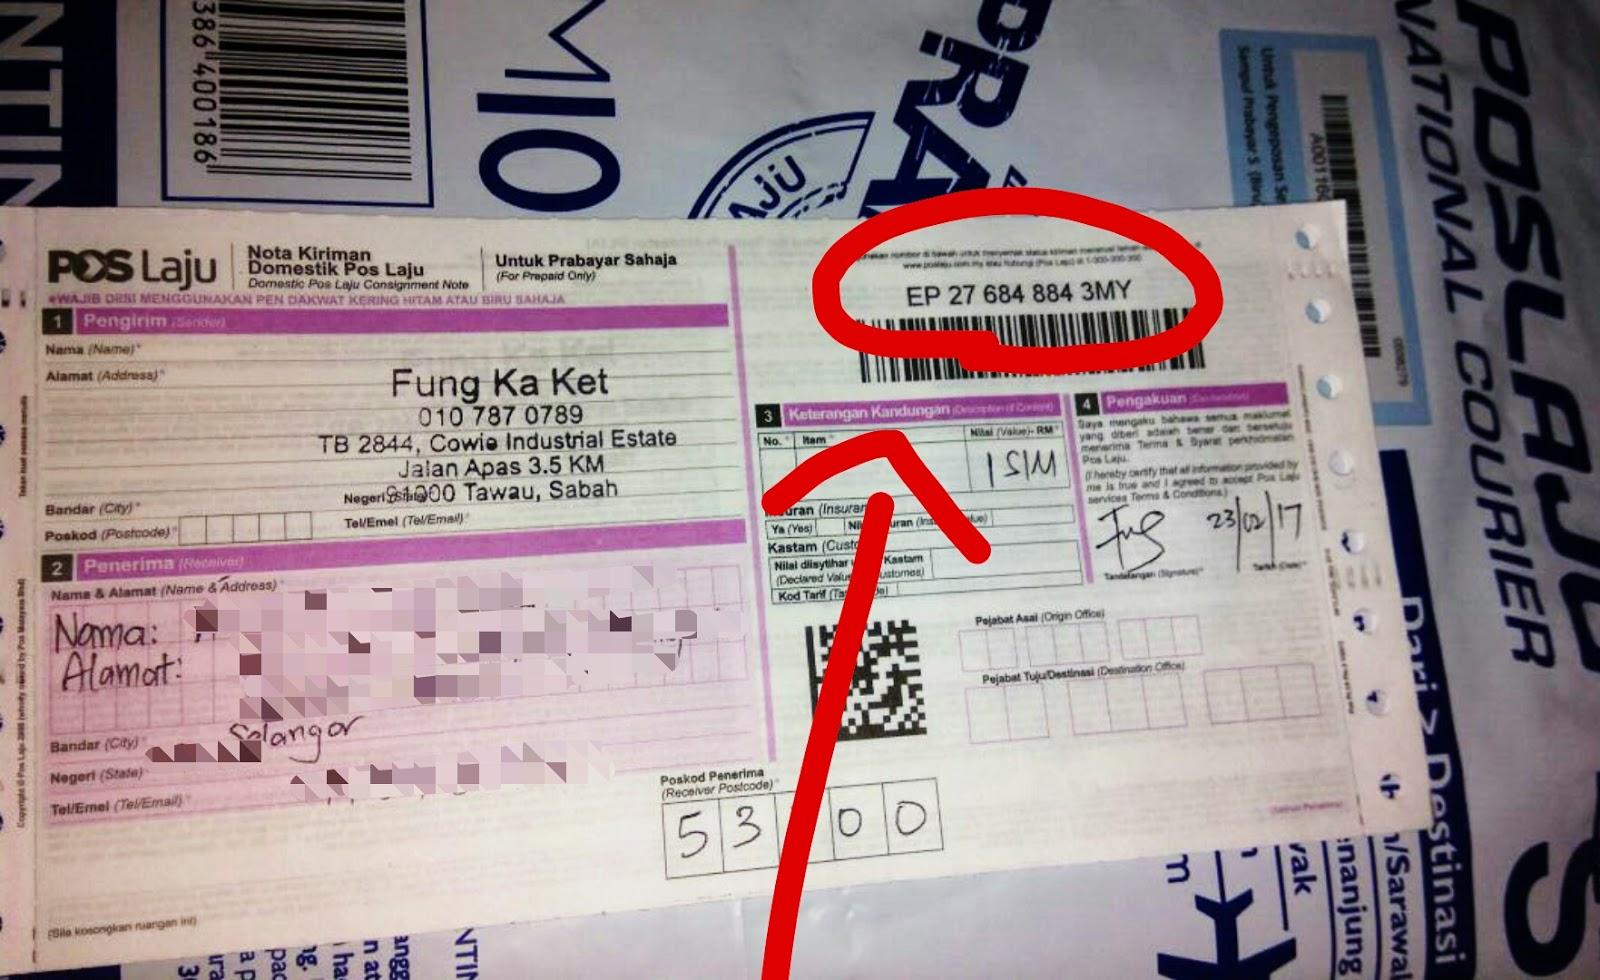 Semak Tracking Number Pos Laju Malaysia Melalui Online Dan Sms